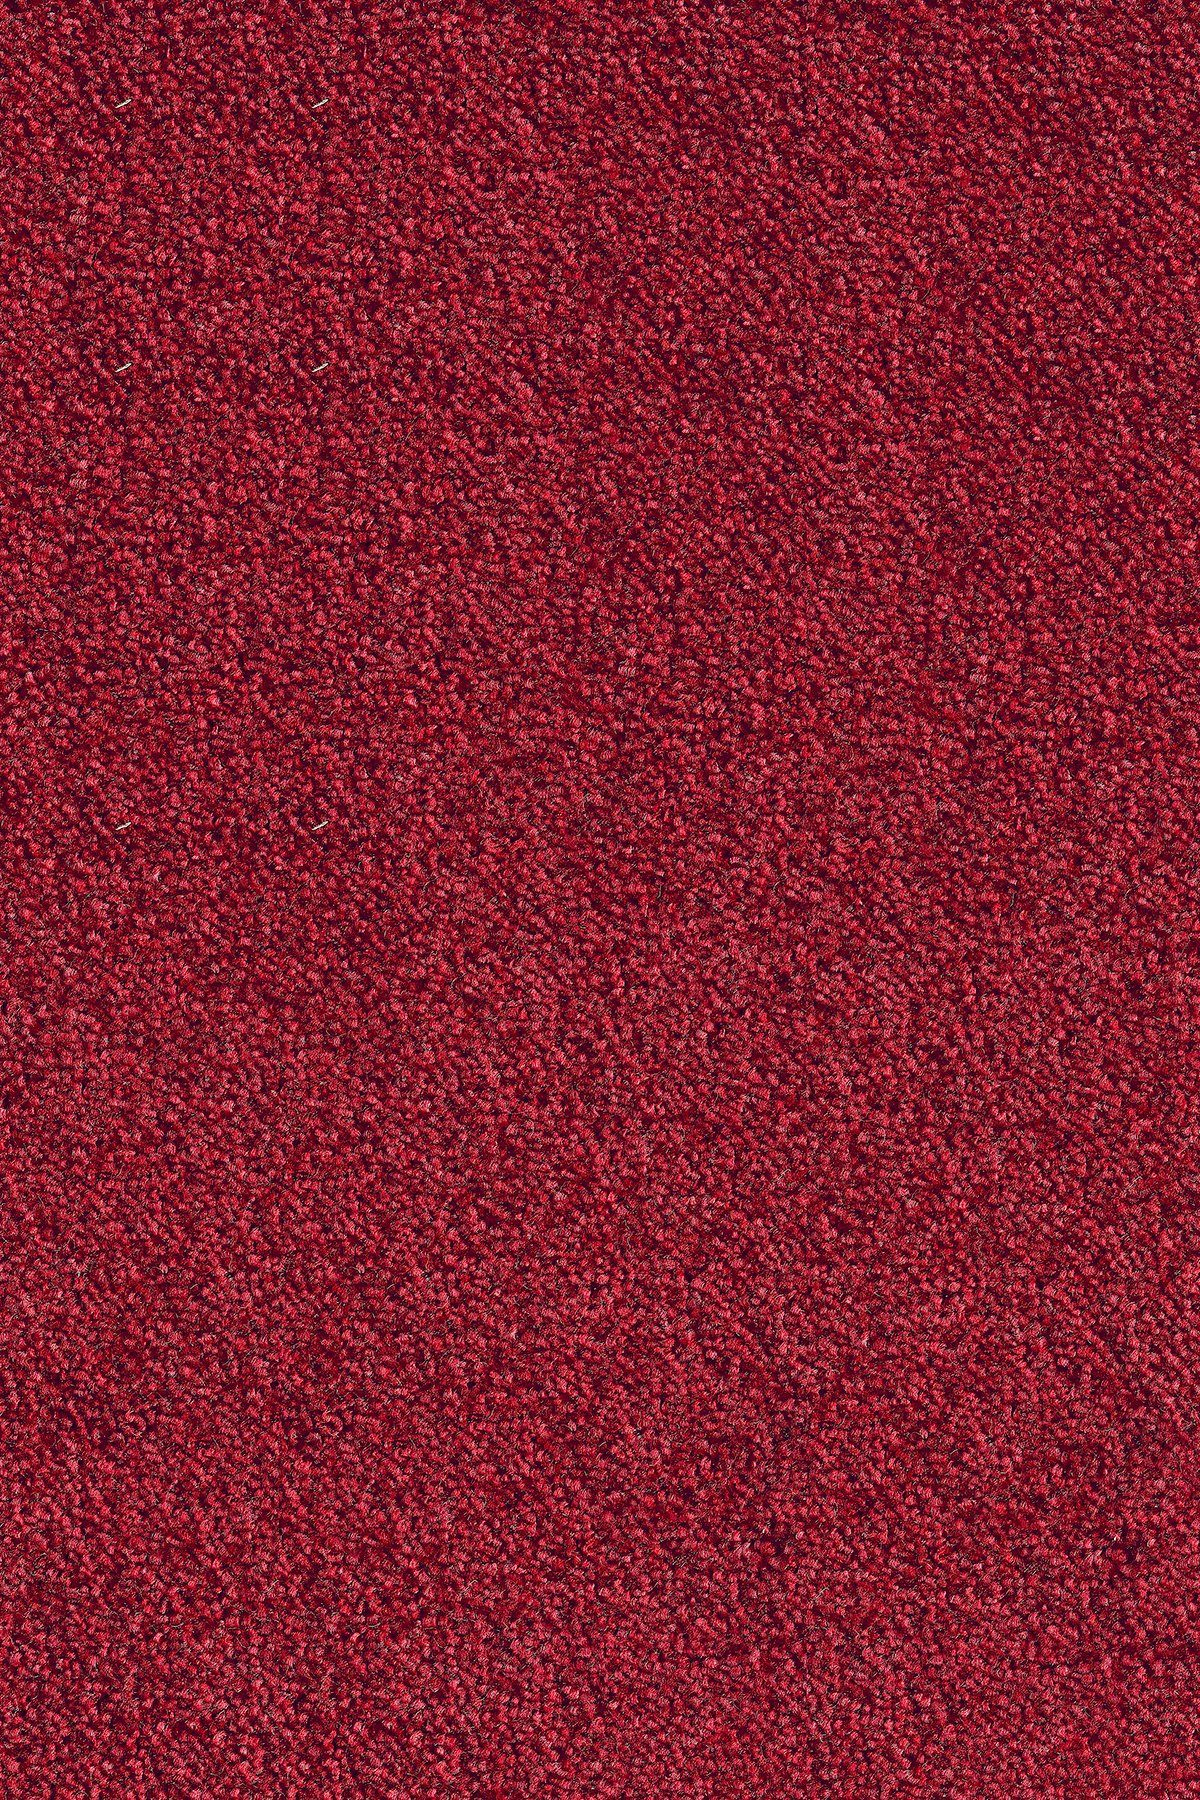 ANDIAMO Teppichboden »Levin rot«, Breite 400 cm